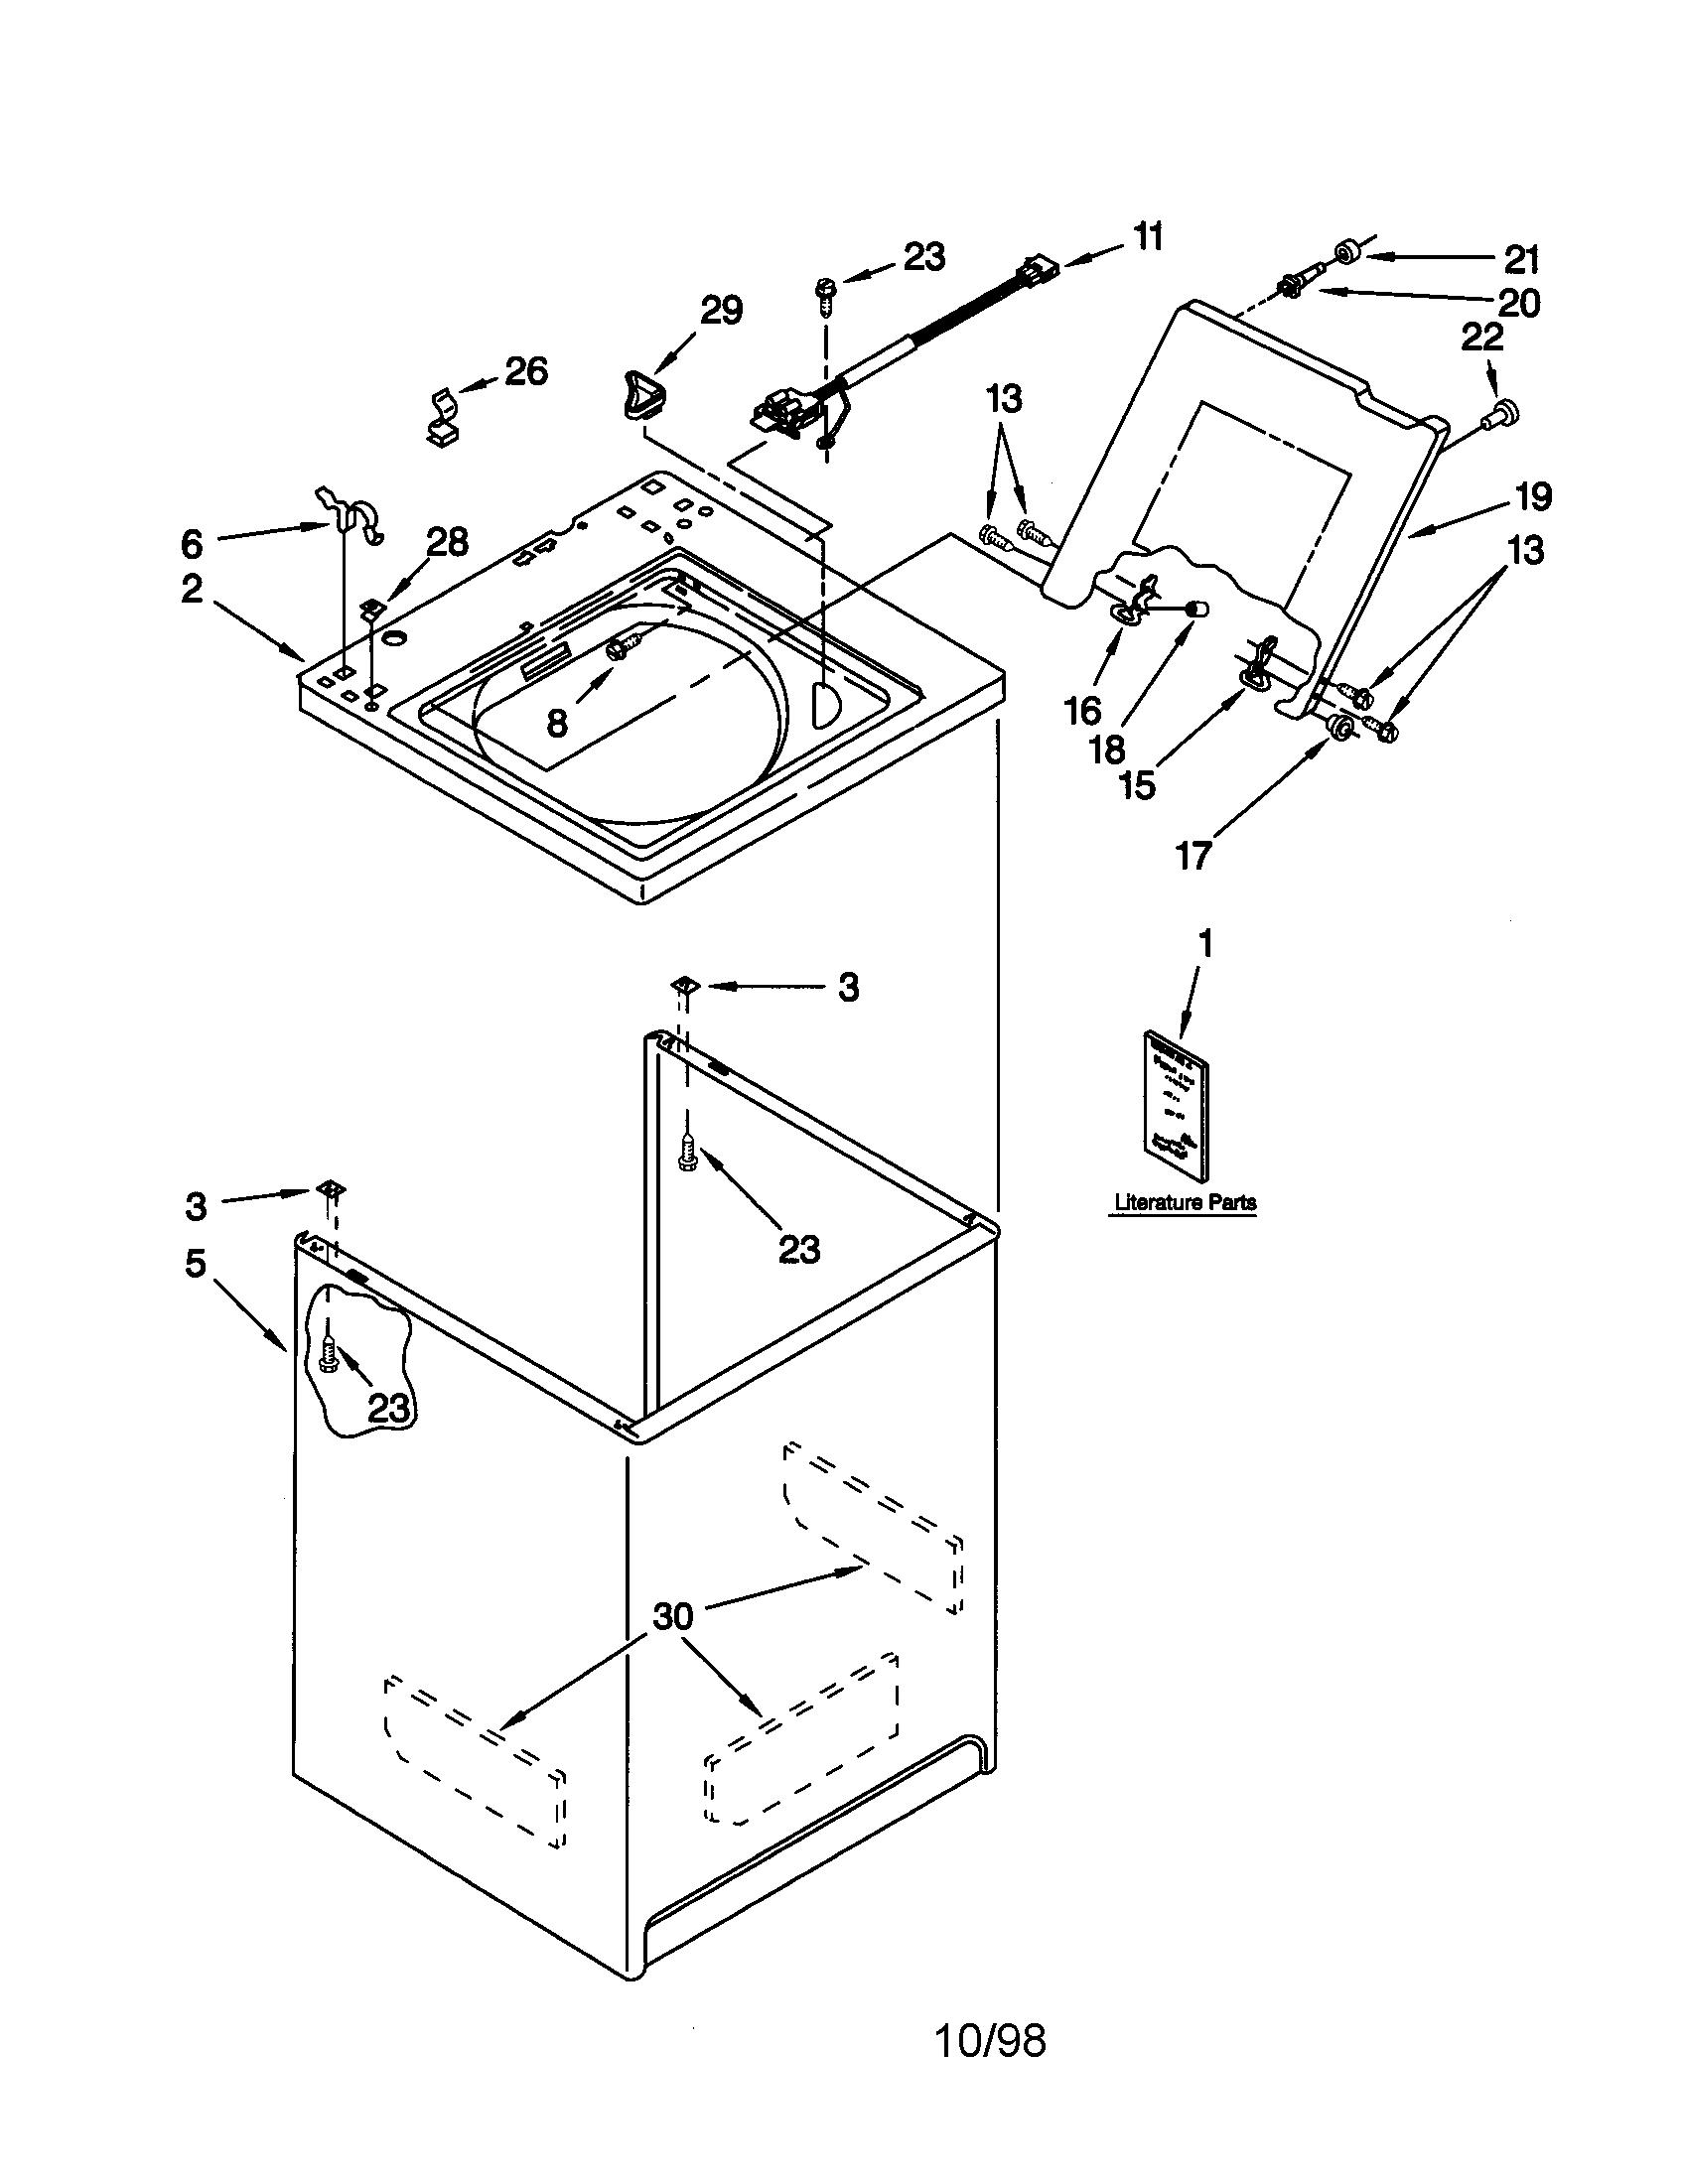 E67 Wiring Diagram Snatch Block Diagrams ~ Elsavadorla